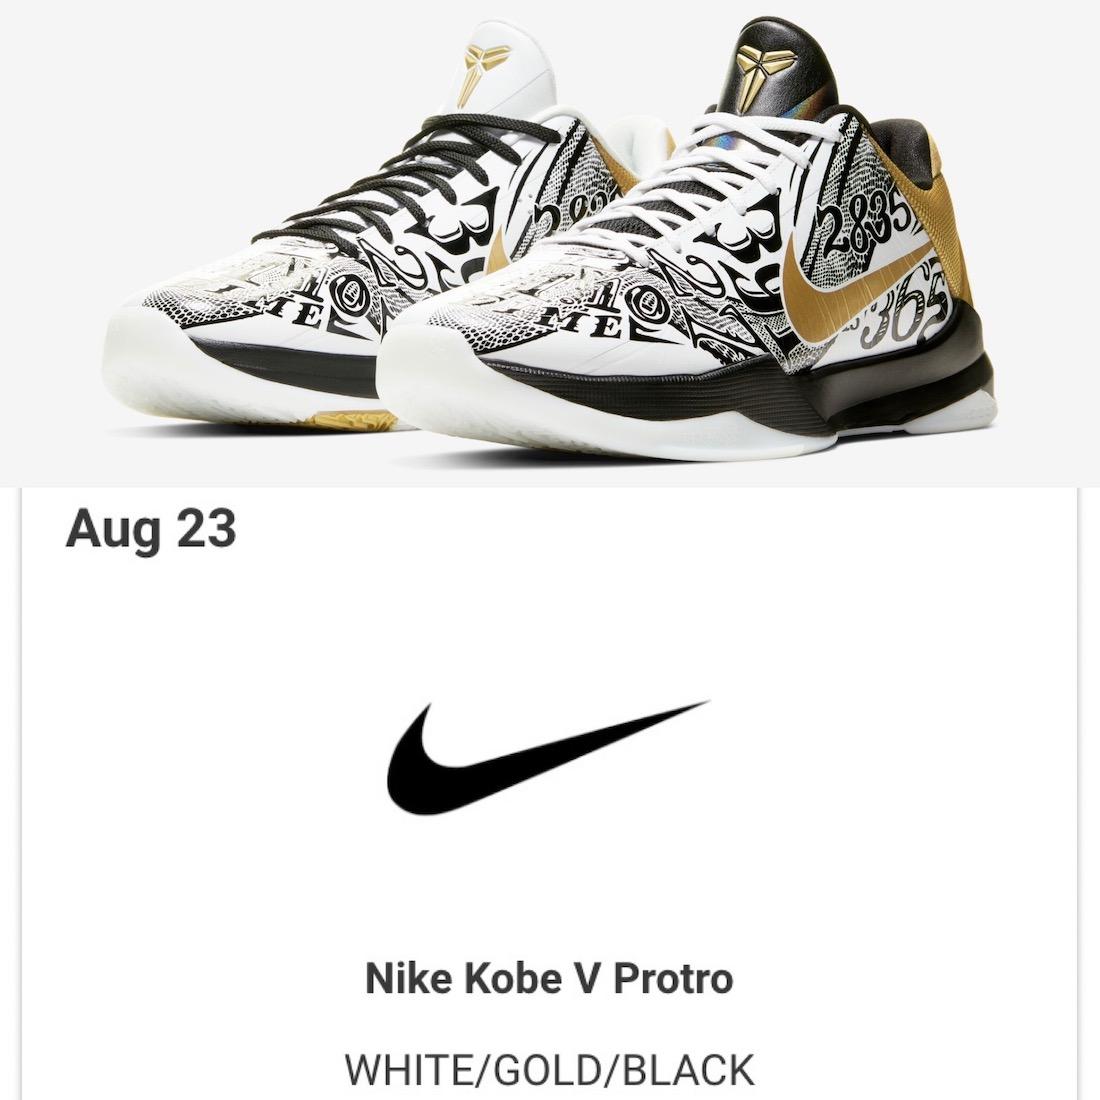 Nike Kobe 5 Protro Big Stage CT8014-100